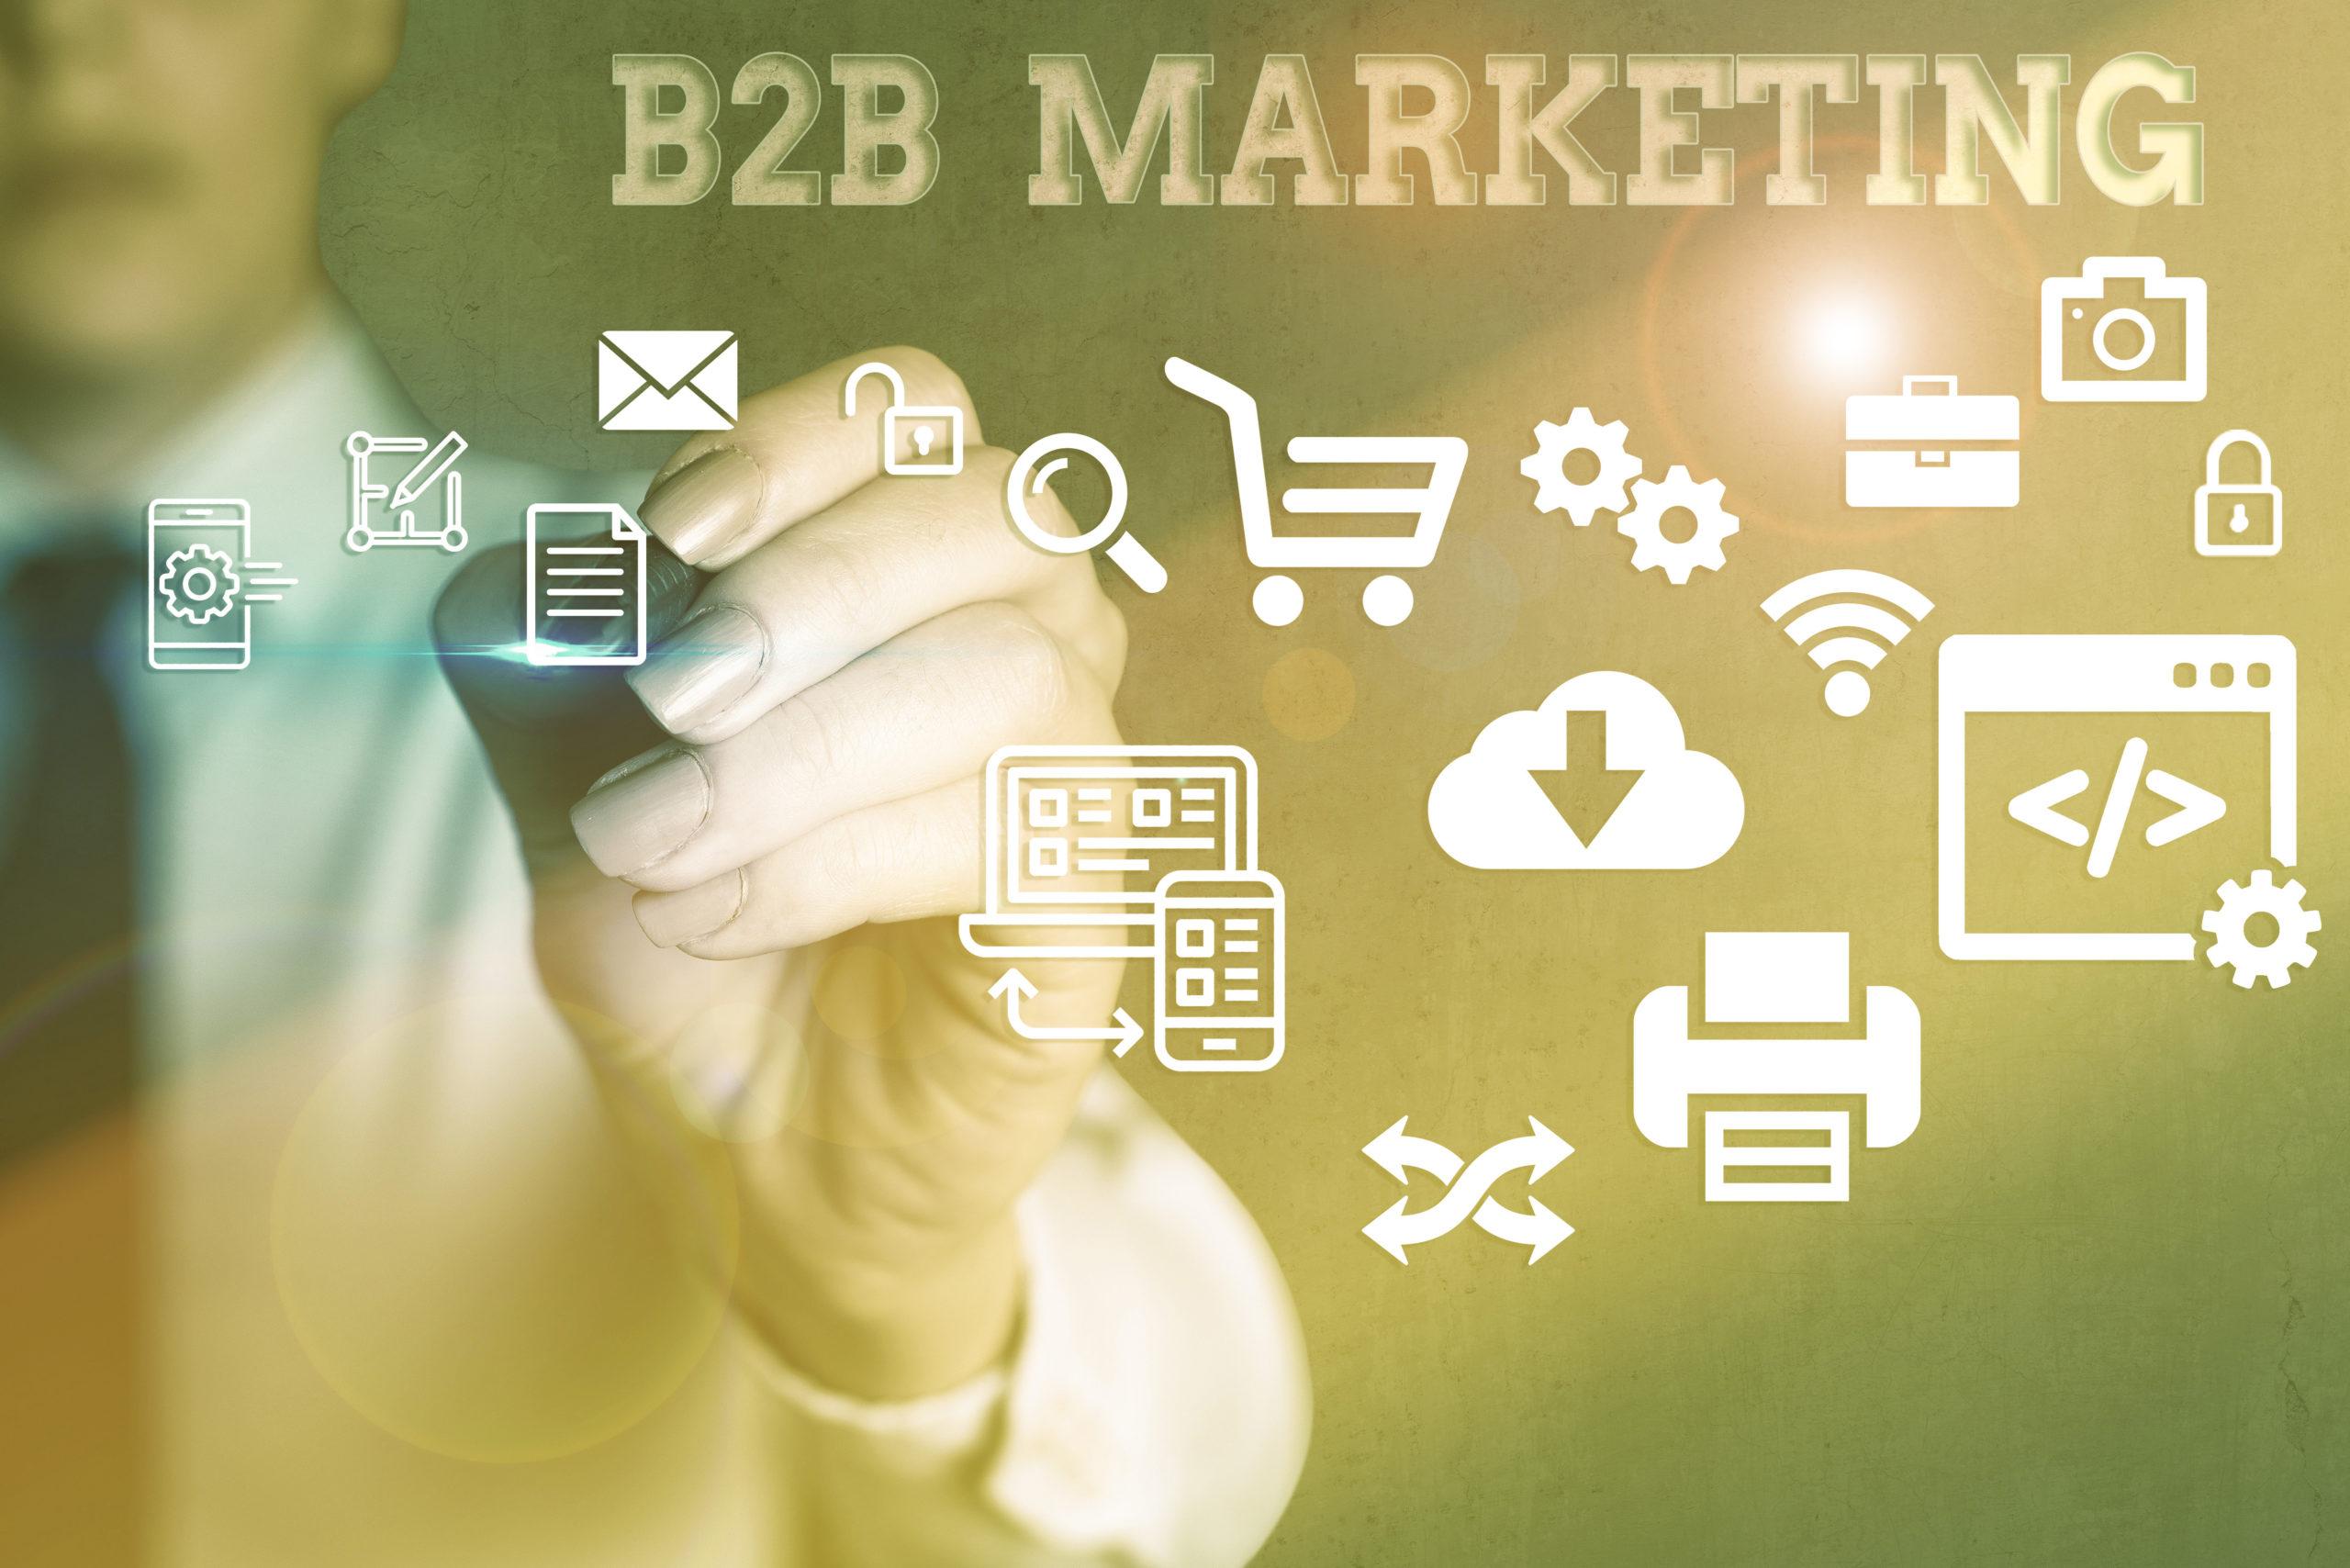 3 B2B Marketing Strategies That Experts Swear By